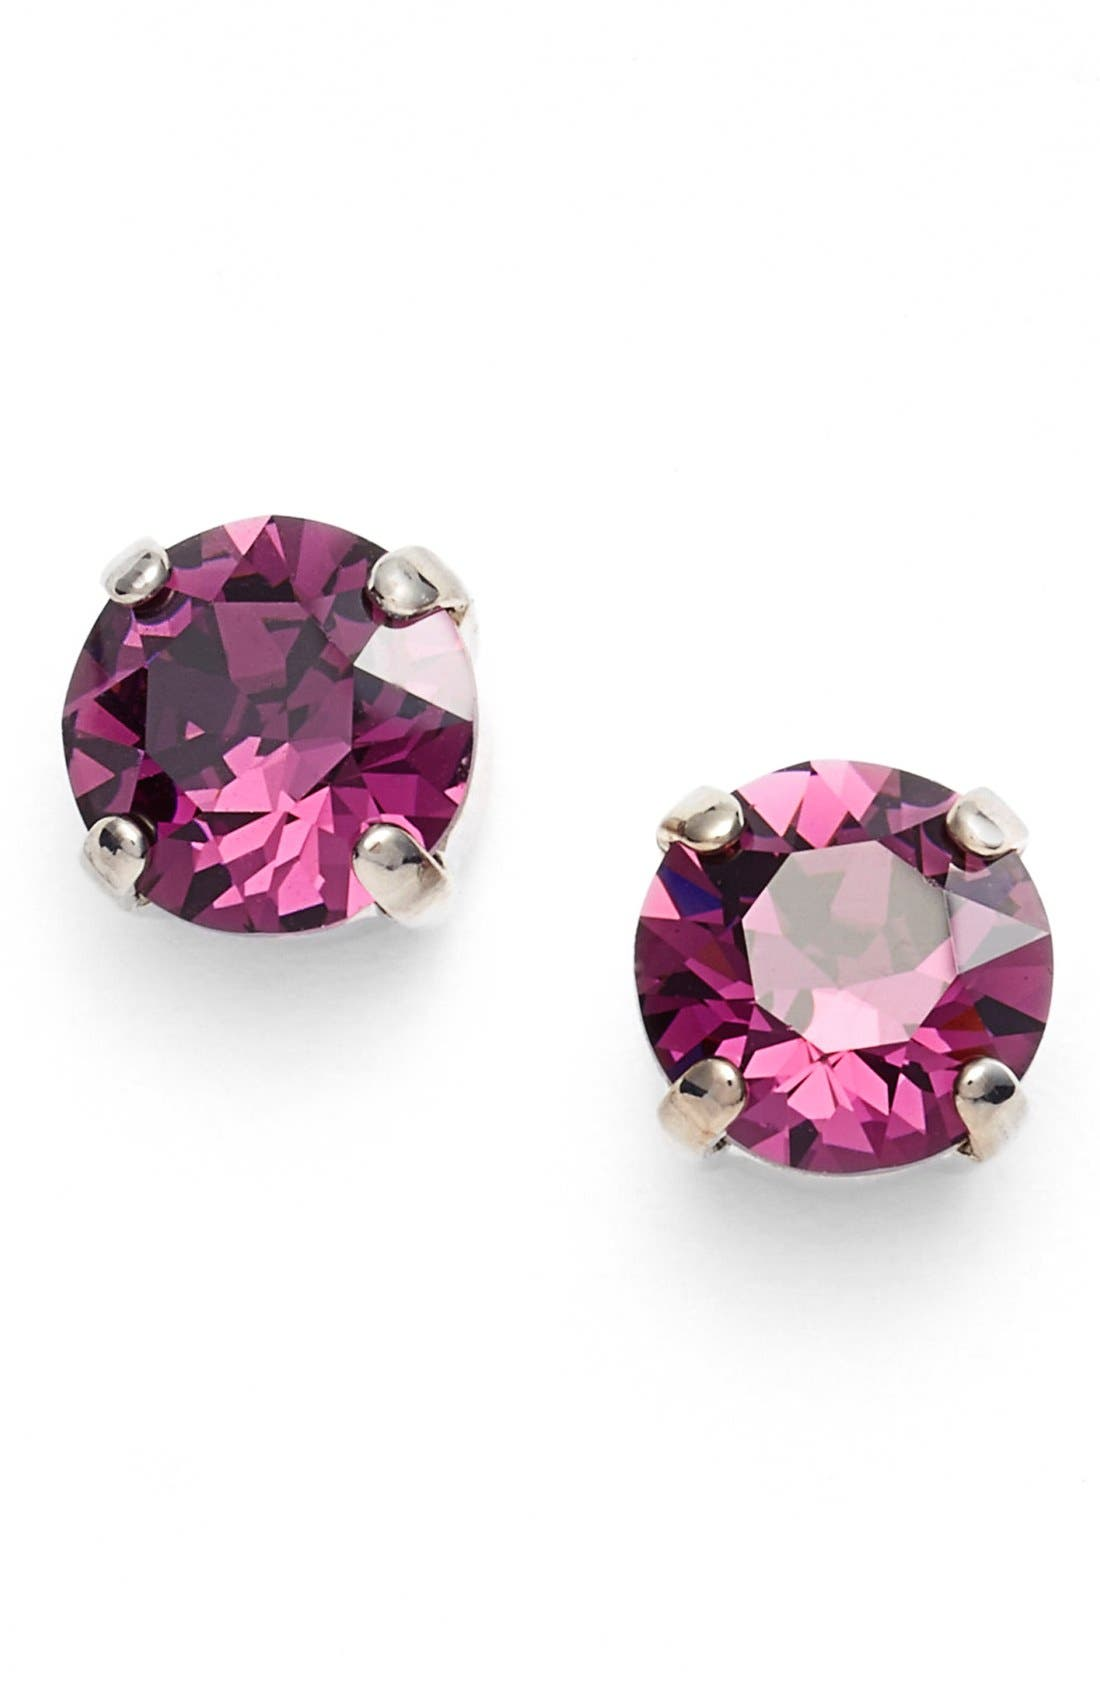 L. Erickson 'Grace' Crystal Stud Earrings